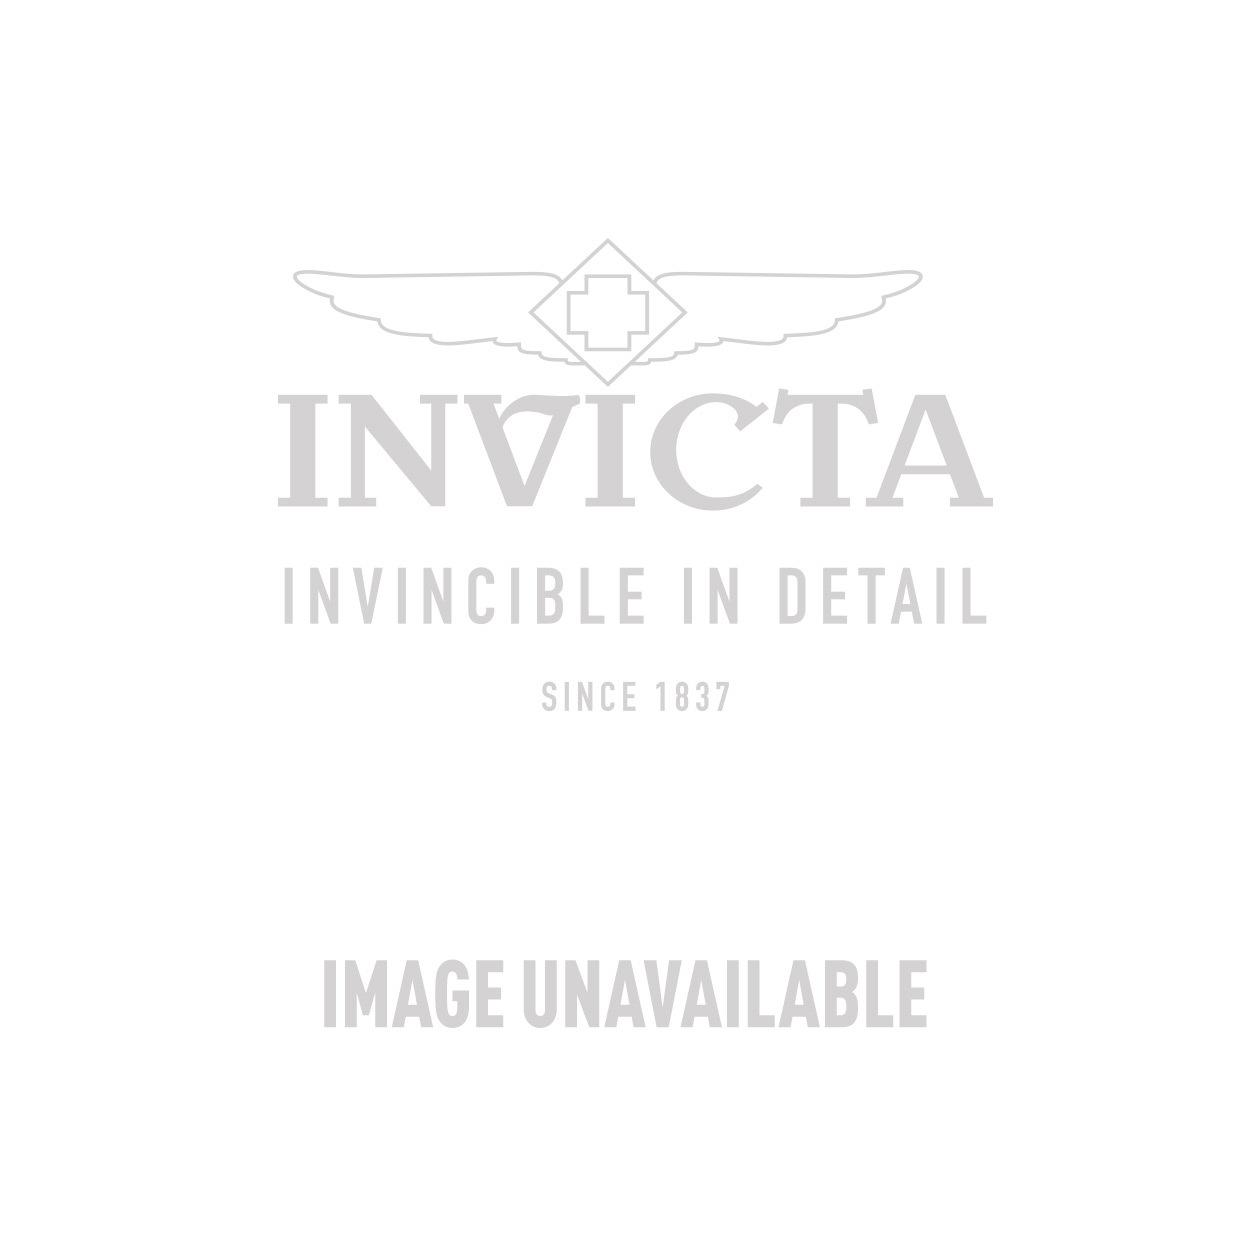 Invicta Reserve Slim Mens 44mm Titanium Case, Black Case, Black Dial,  Silicone Band - Model 23761